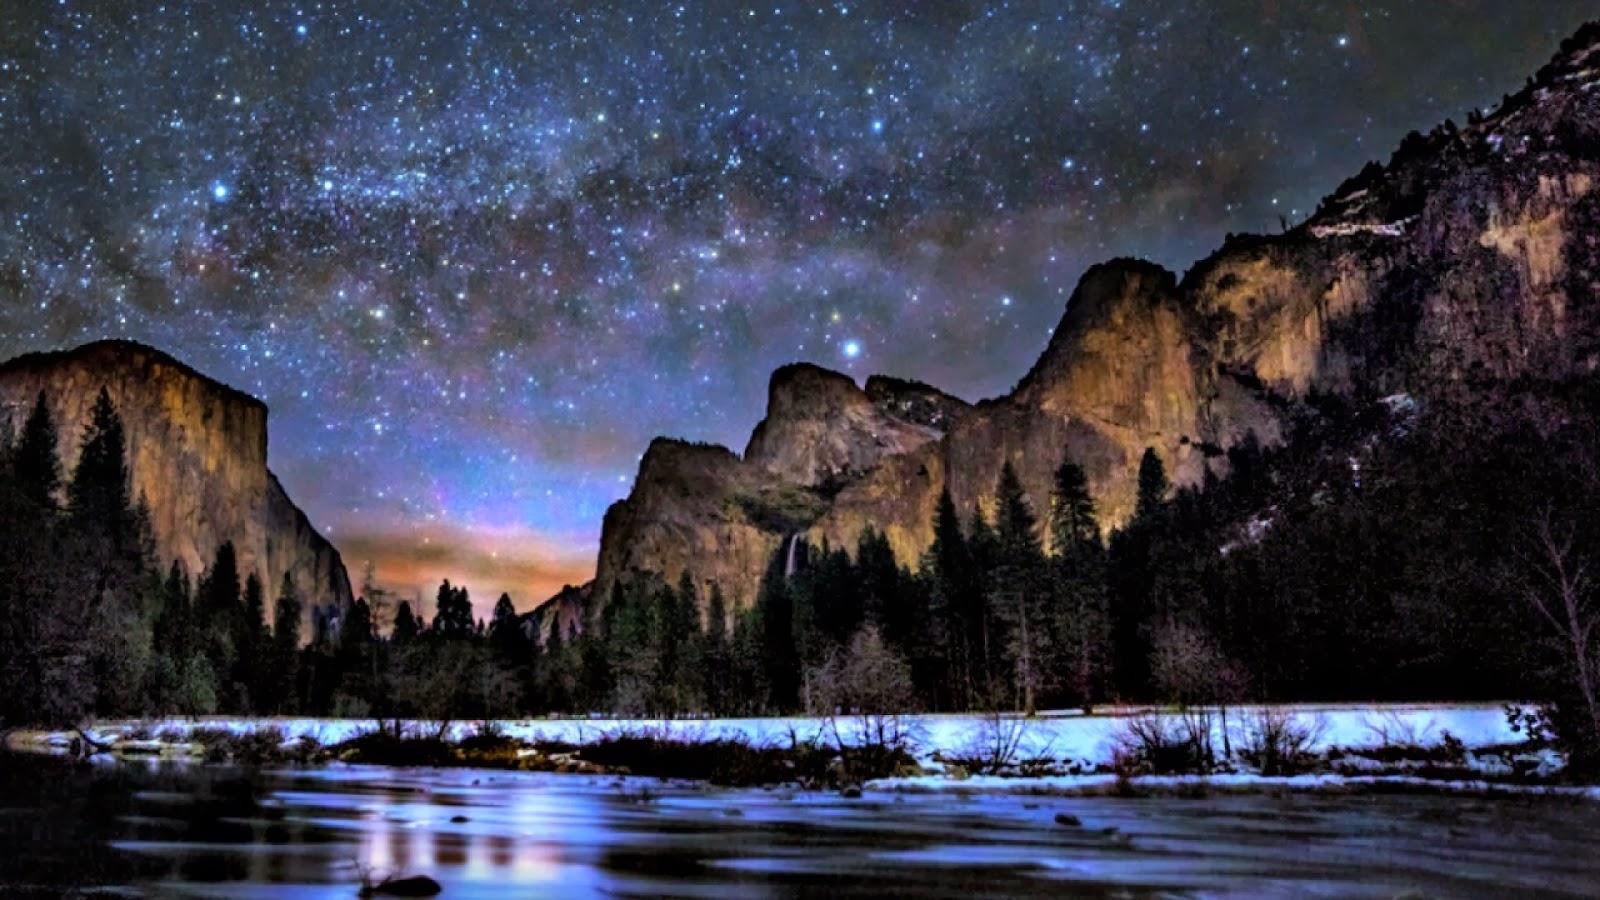 Travel Trip Journey: Yosemite Valley, California, USA